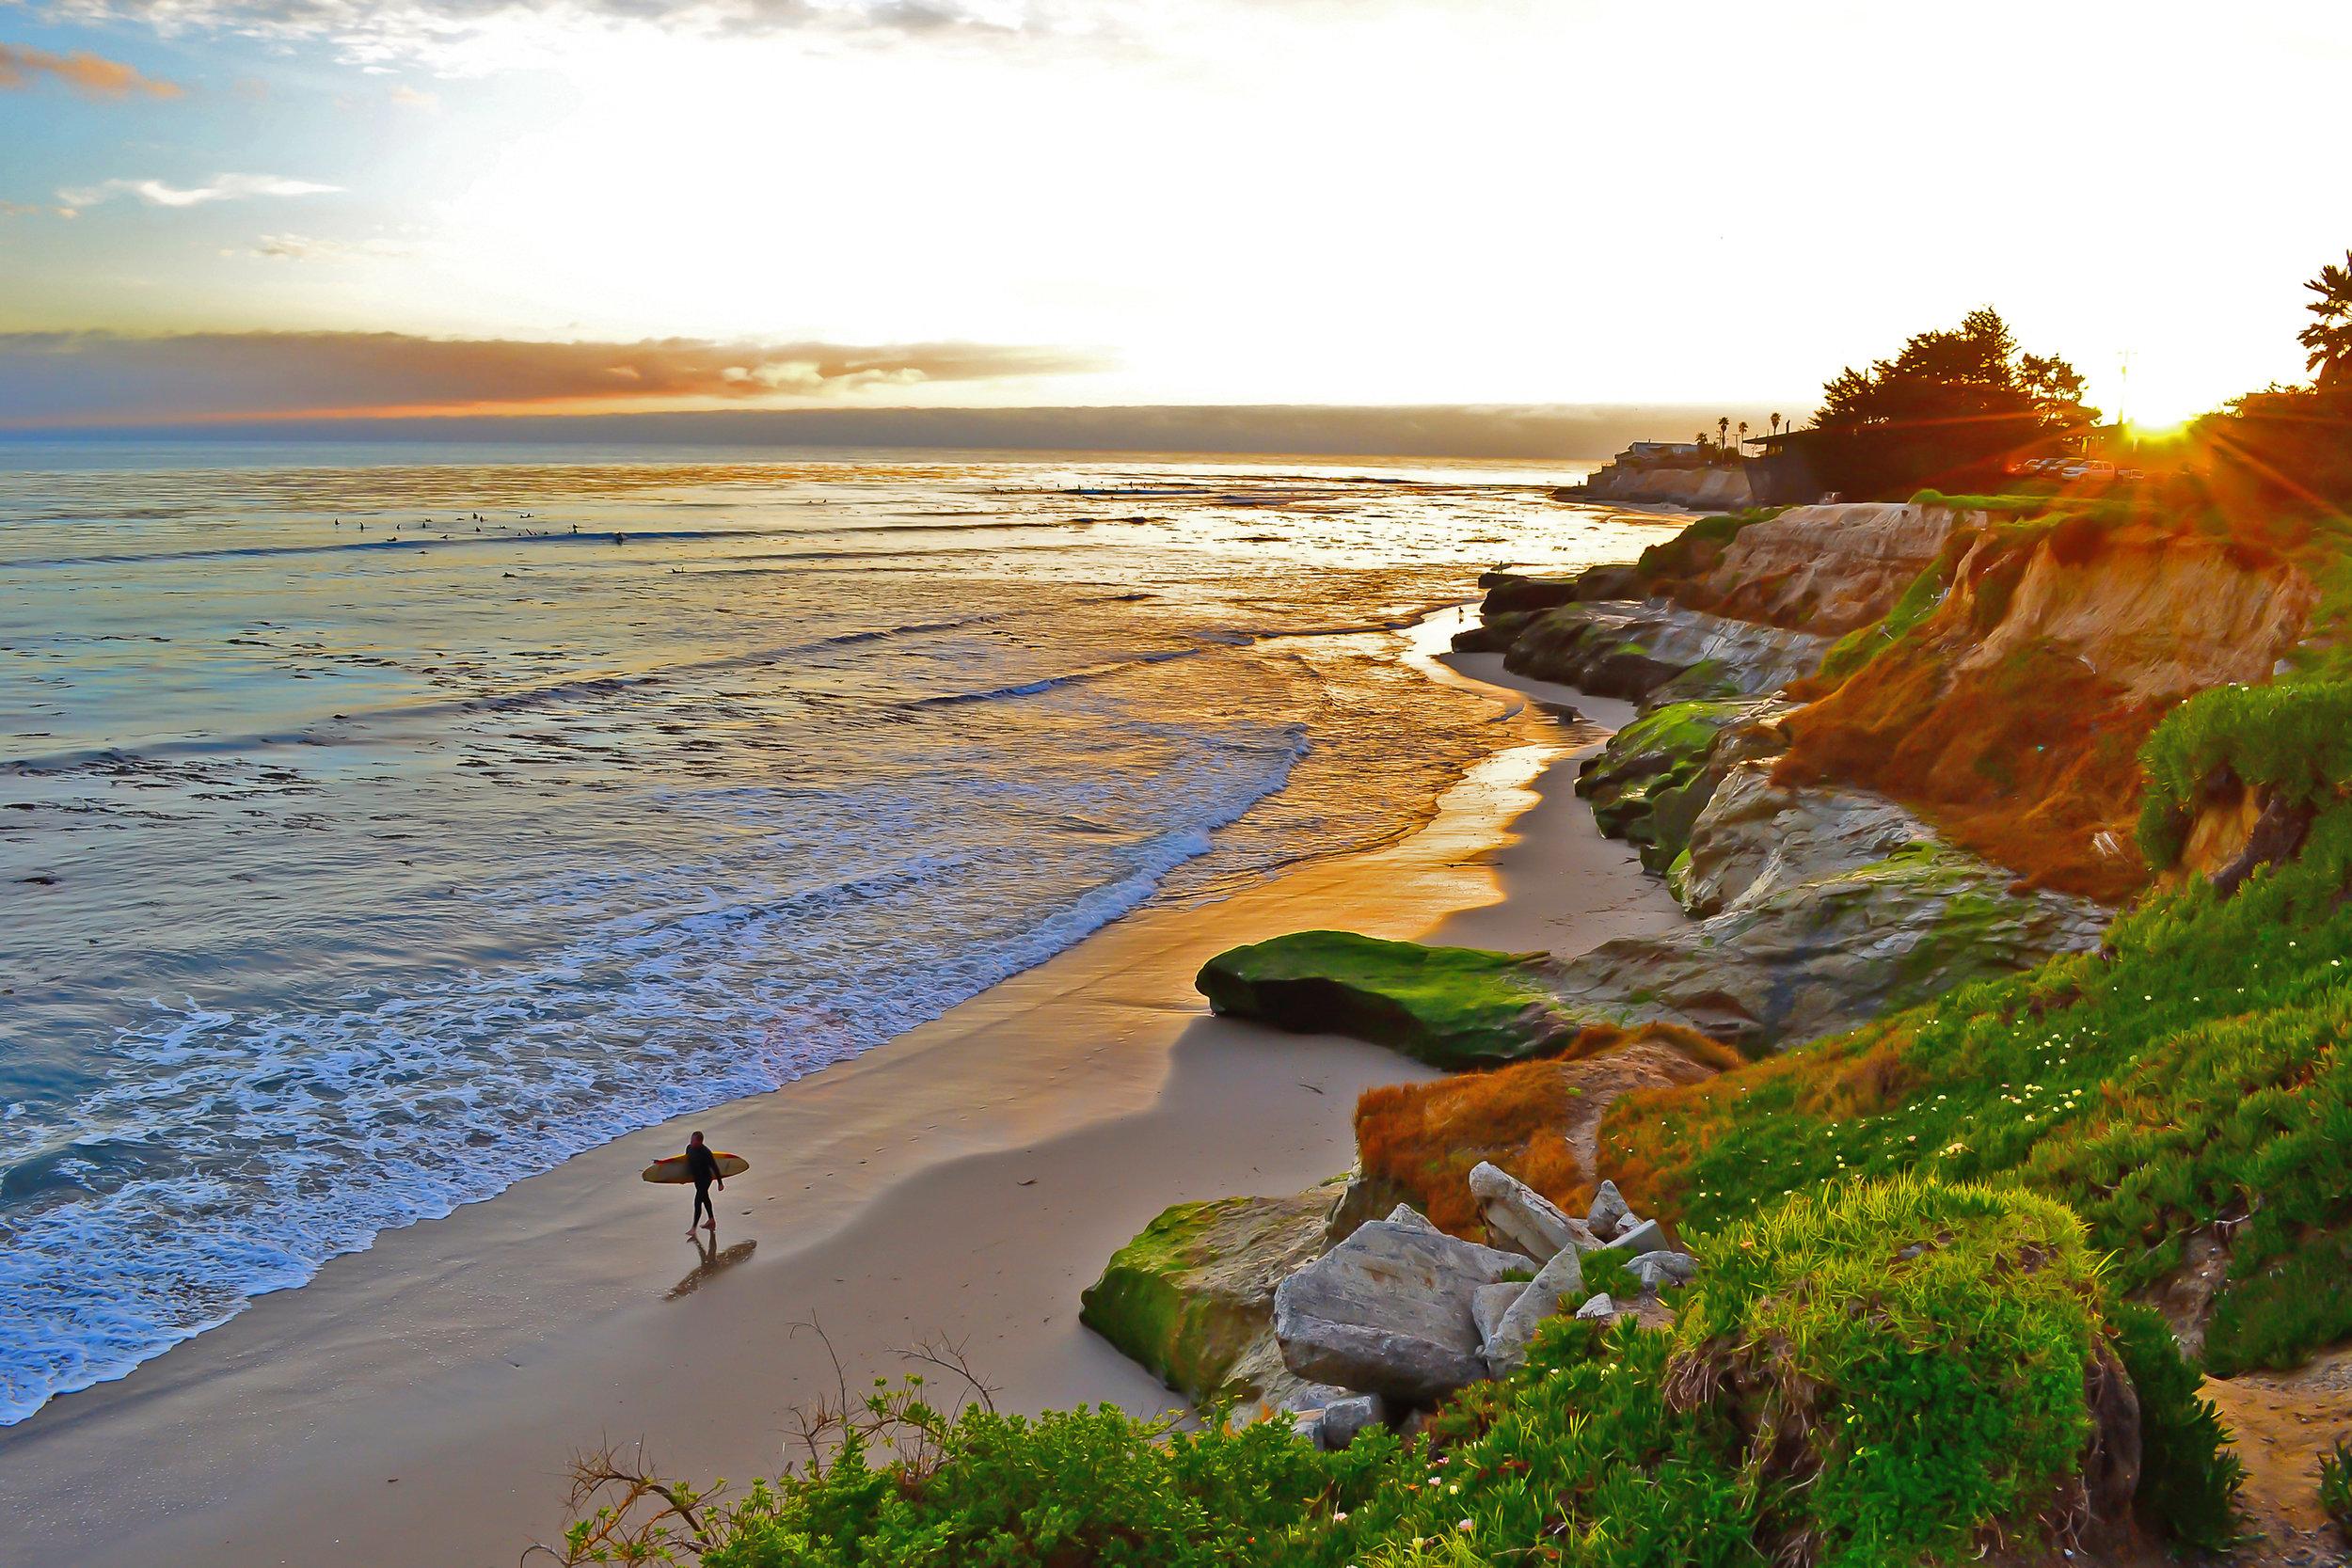 Pleasure Point Surfer Santa Cruz, CA